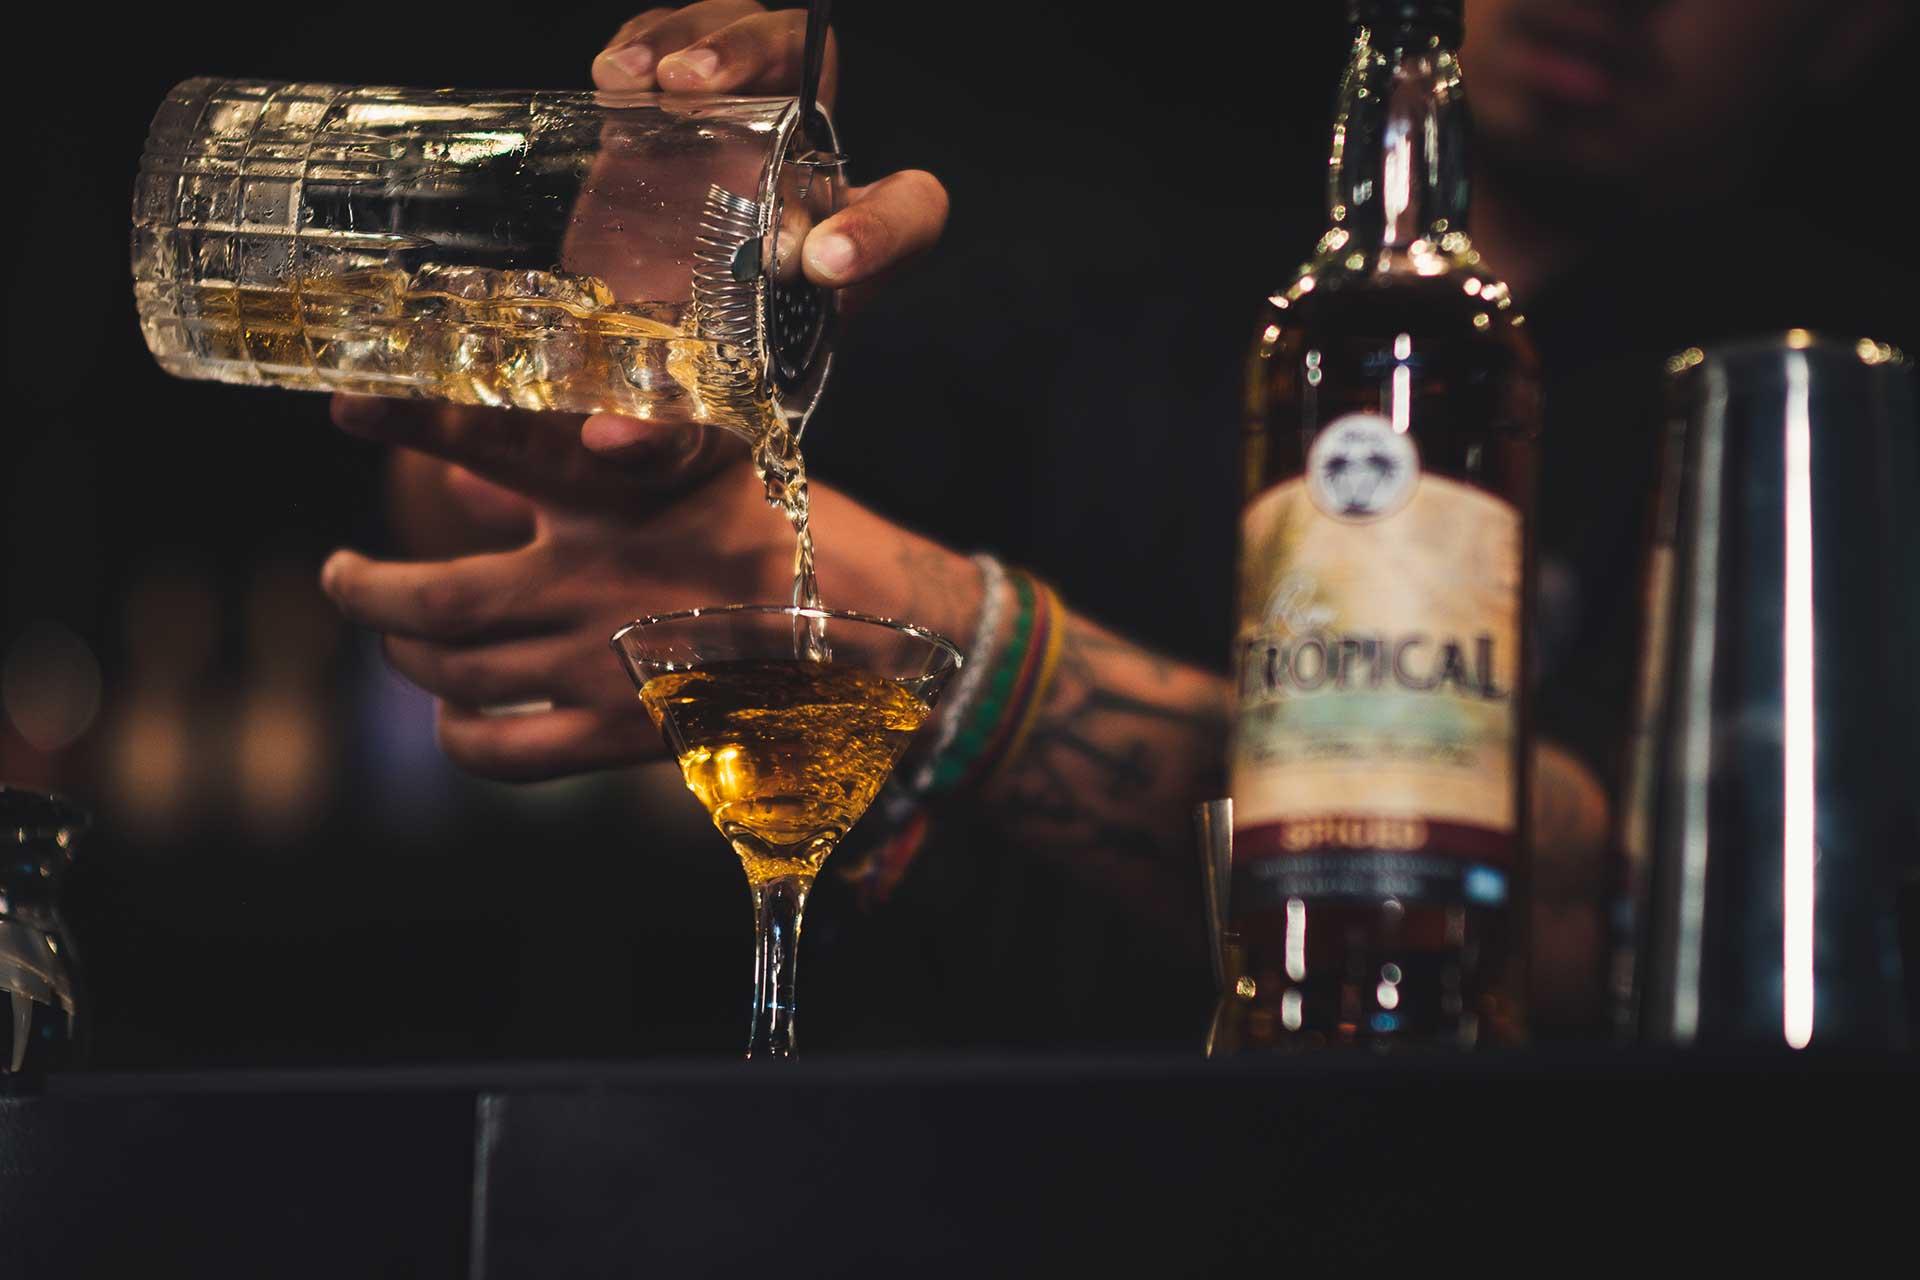 https://weststreetliquorcompany.com/wp-content/uploads/2020/02/WestStreet-Liquor-Company-Drinks-1-5.jpg